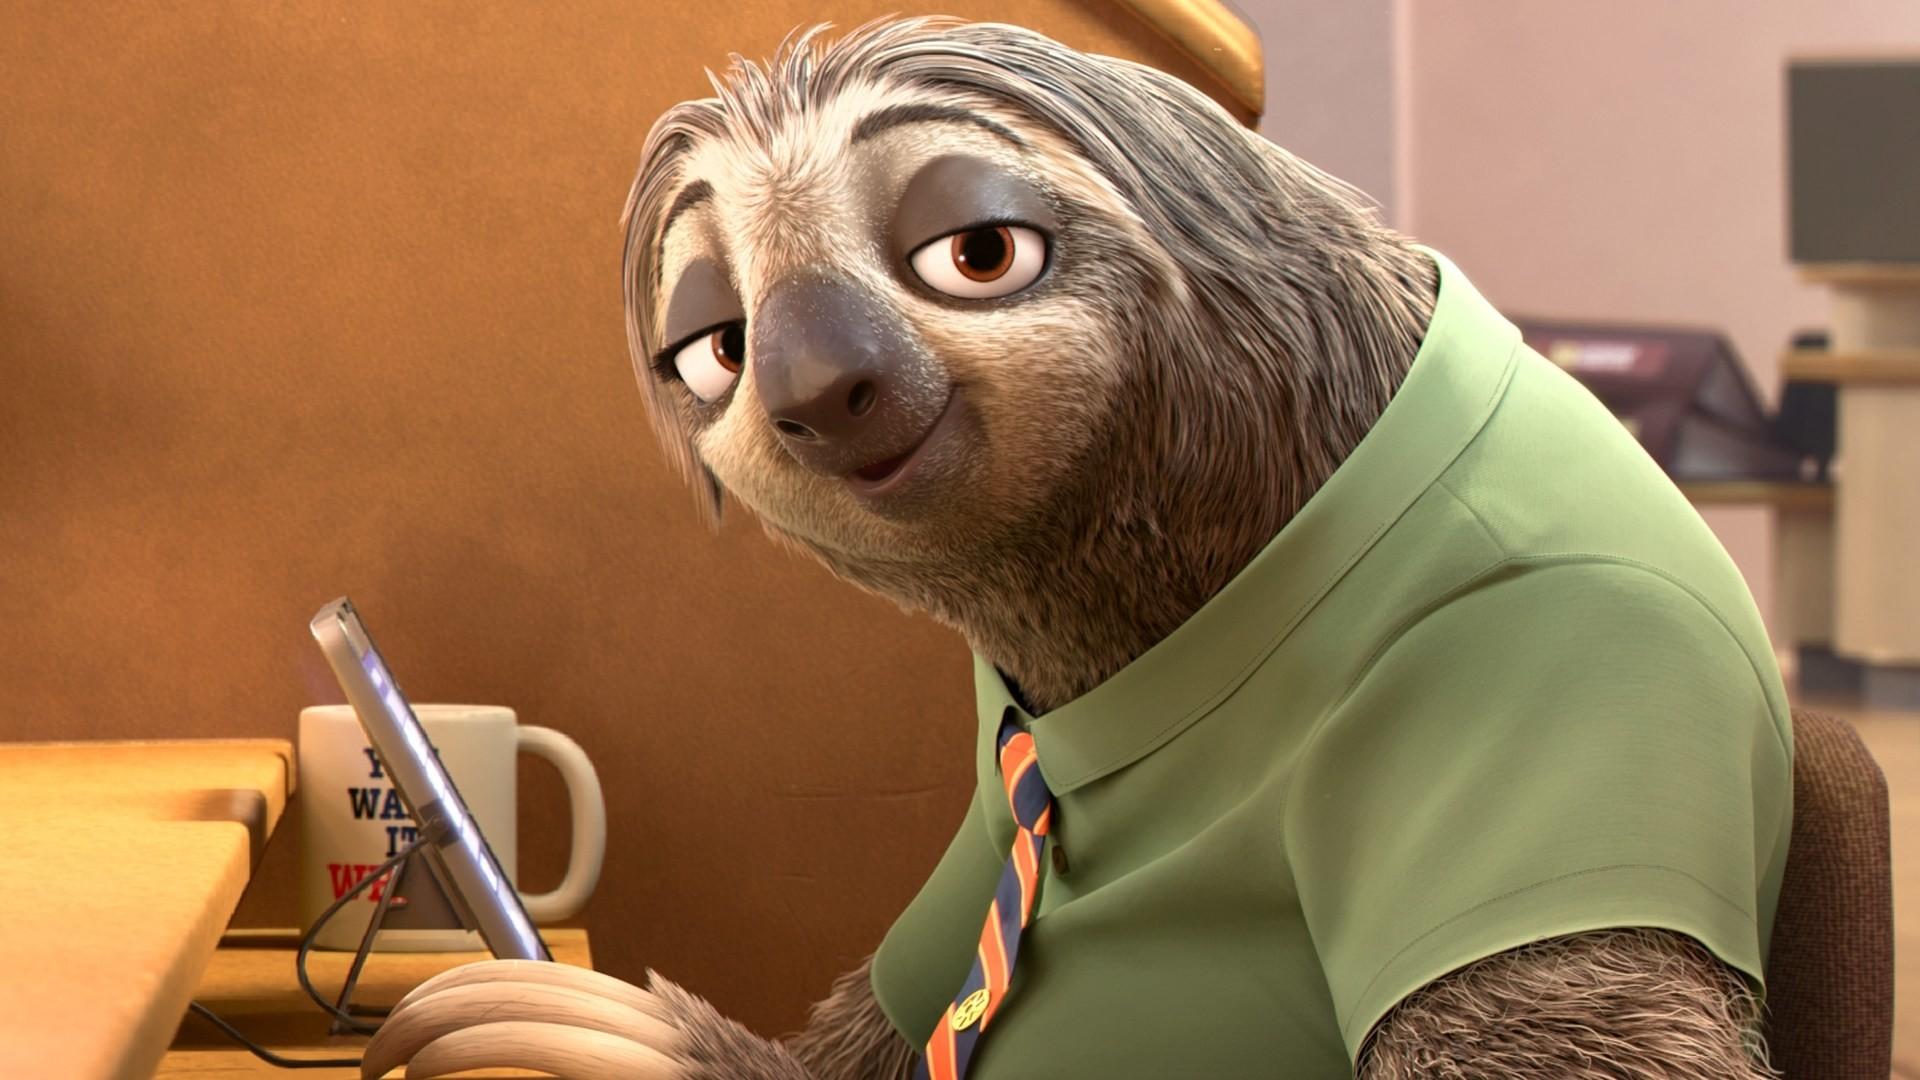 Zootopia Flash Slothmore 1080p HD Wallpaper Background